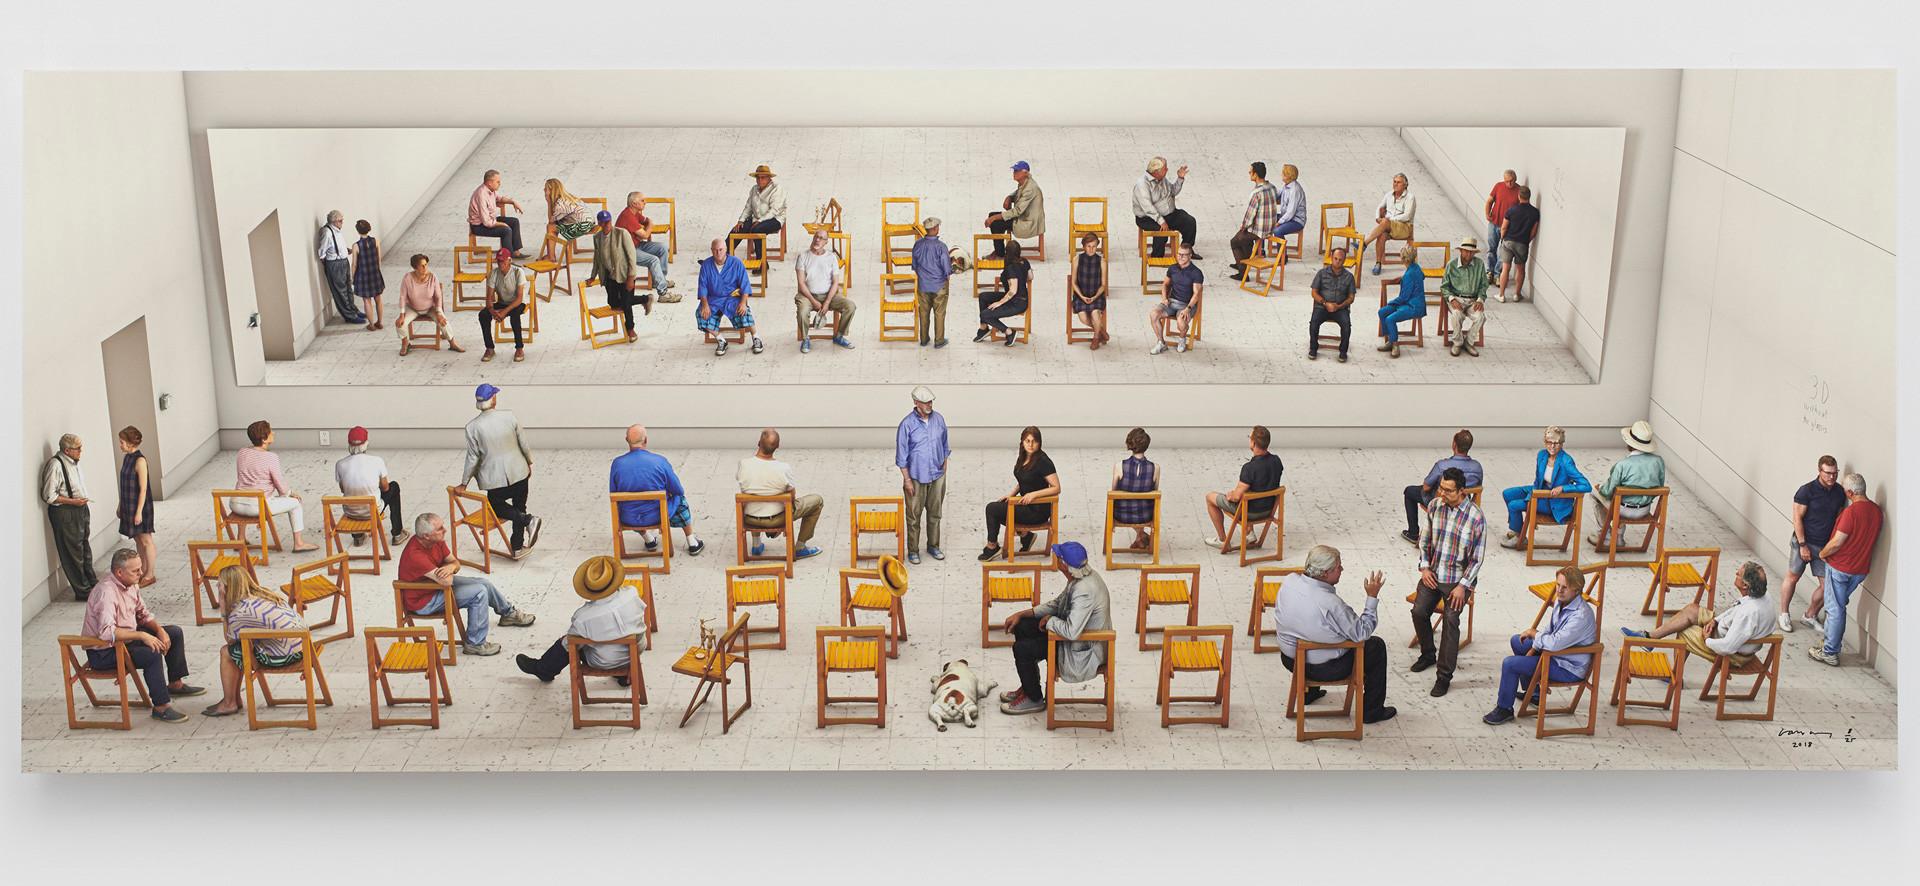 David Hockney, Pictured Gathering with Mirror, 2018